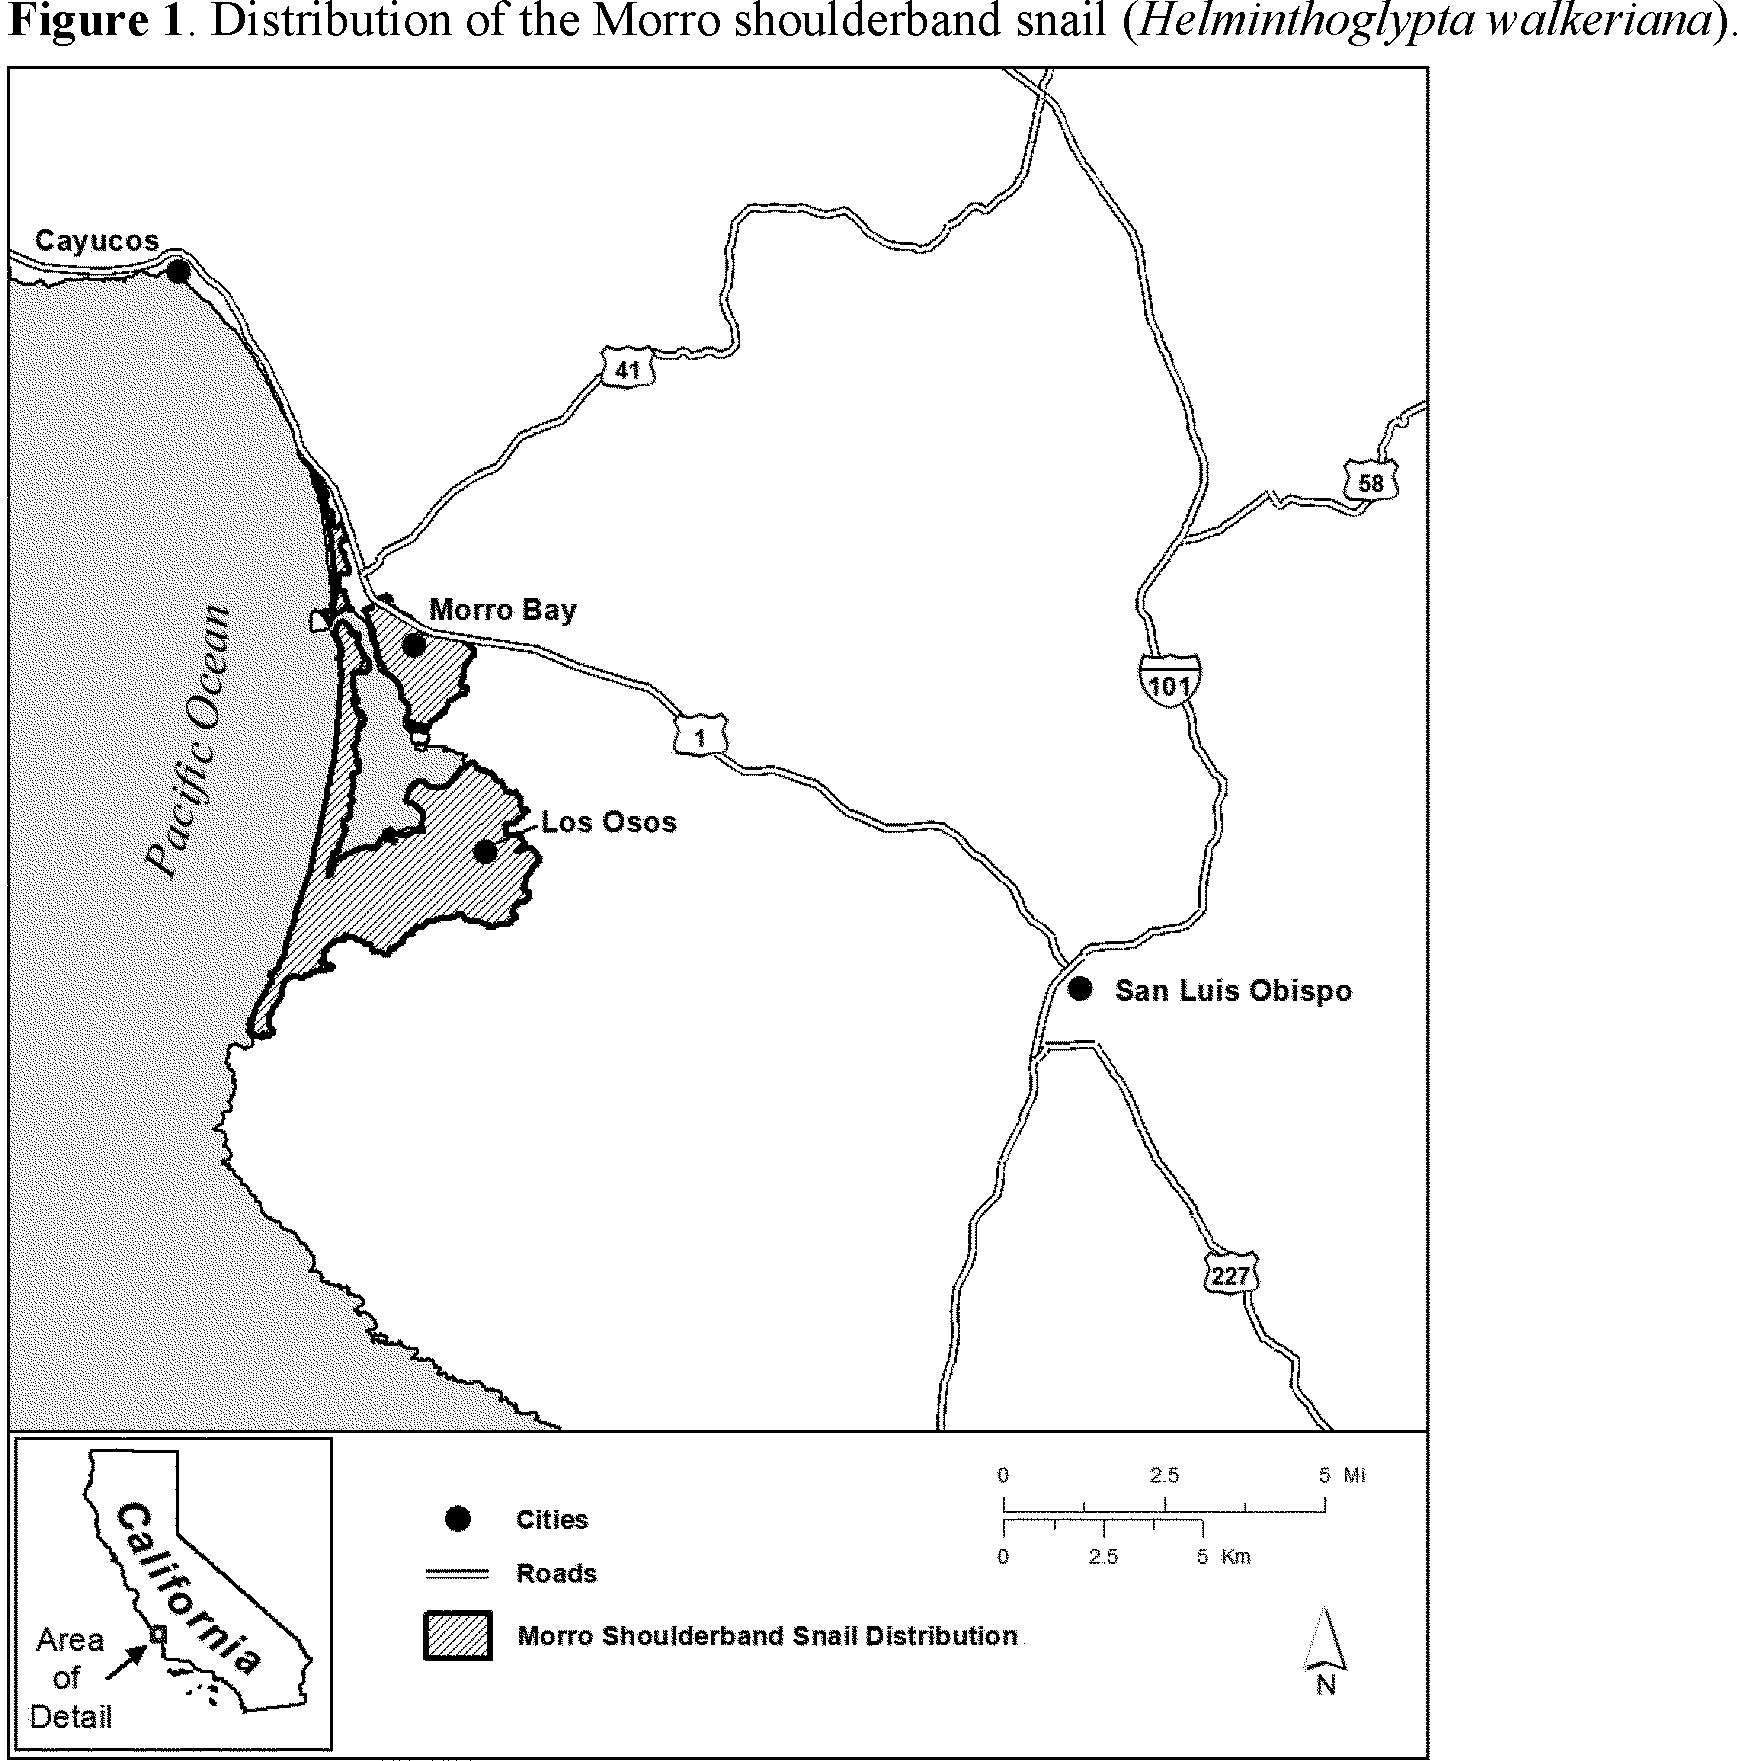 helminthoglypta walkeriana)